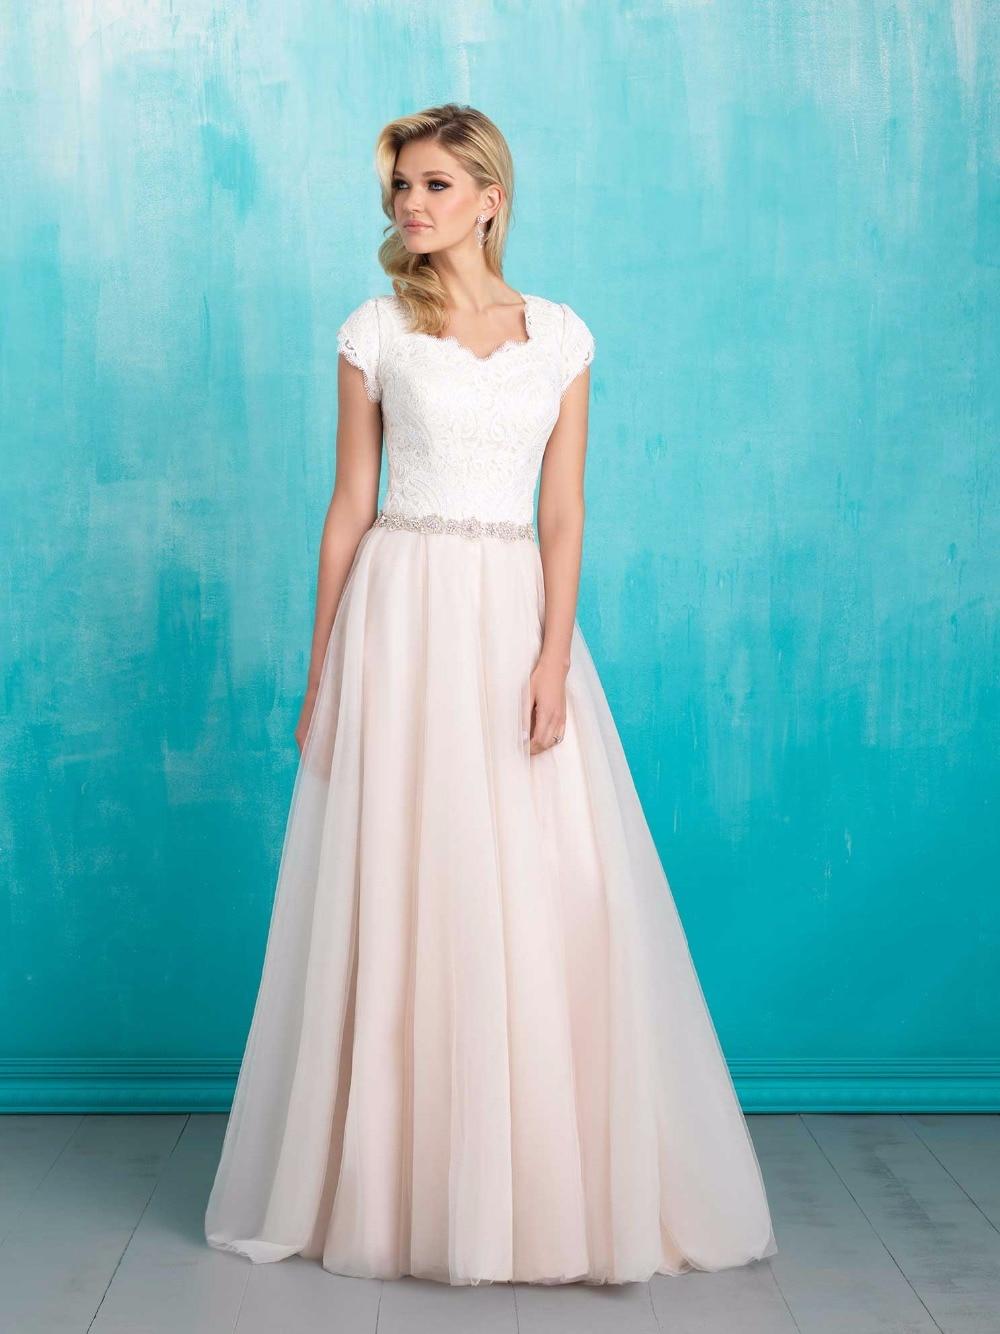 Funky Boho Wedding Dress Image - Wedding Dress - googeb.com